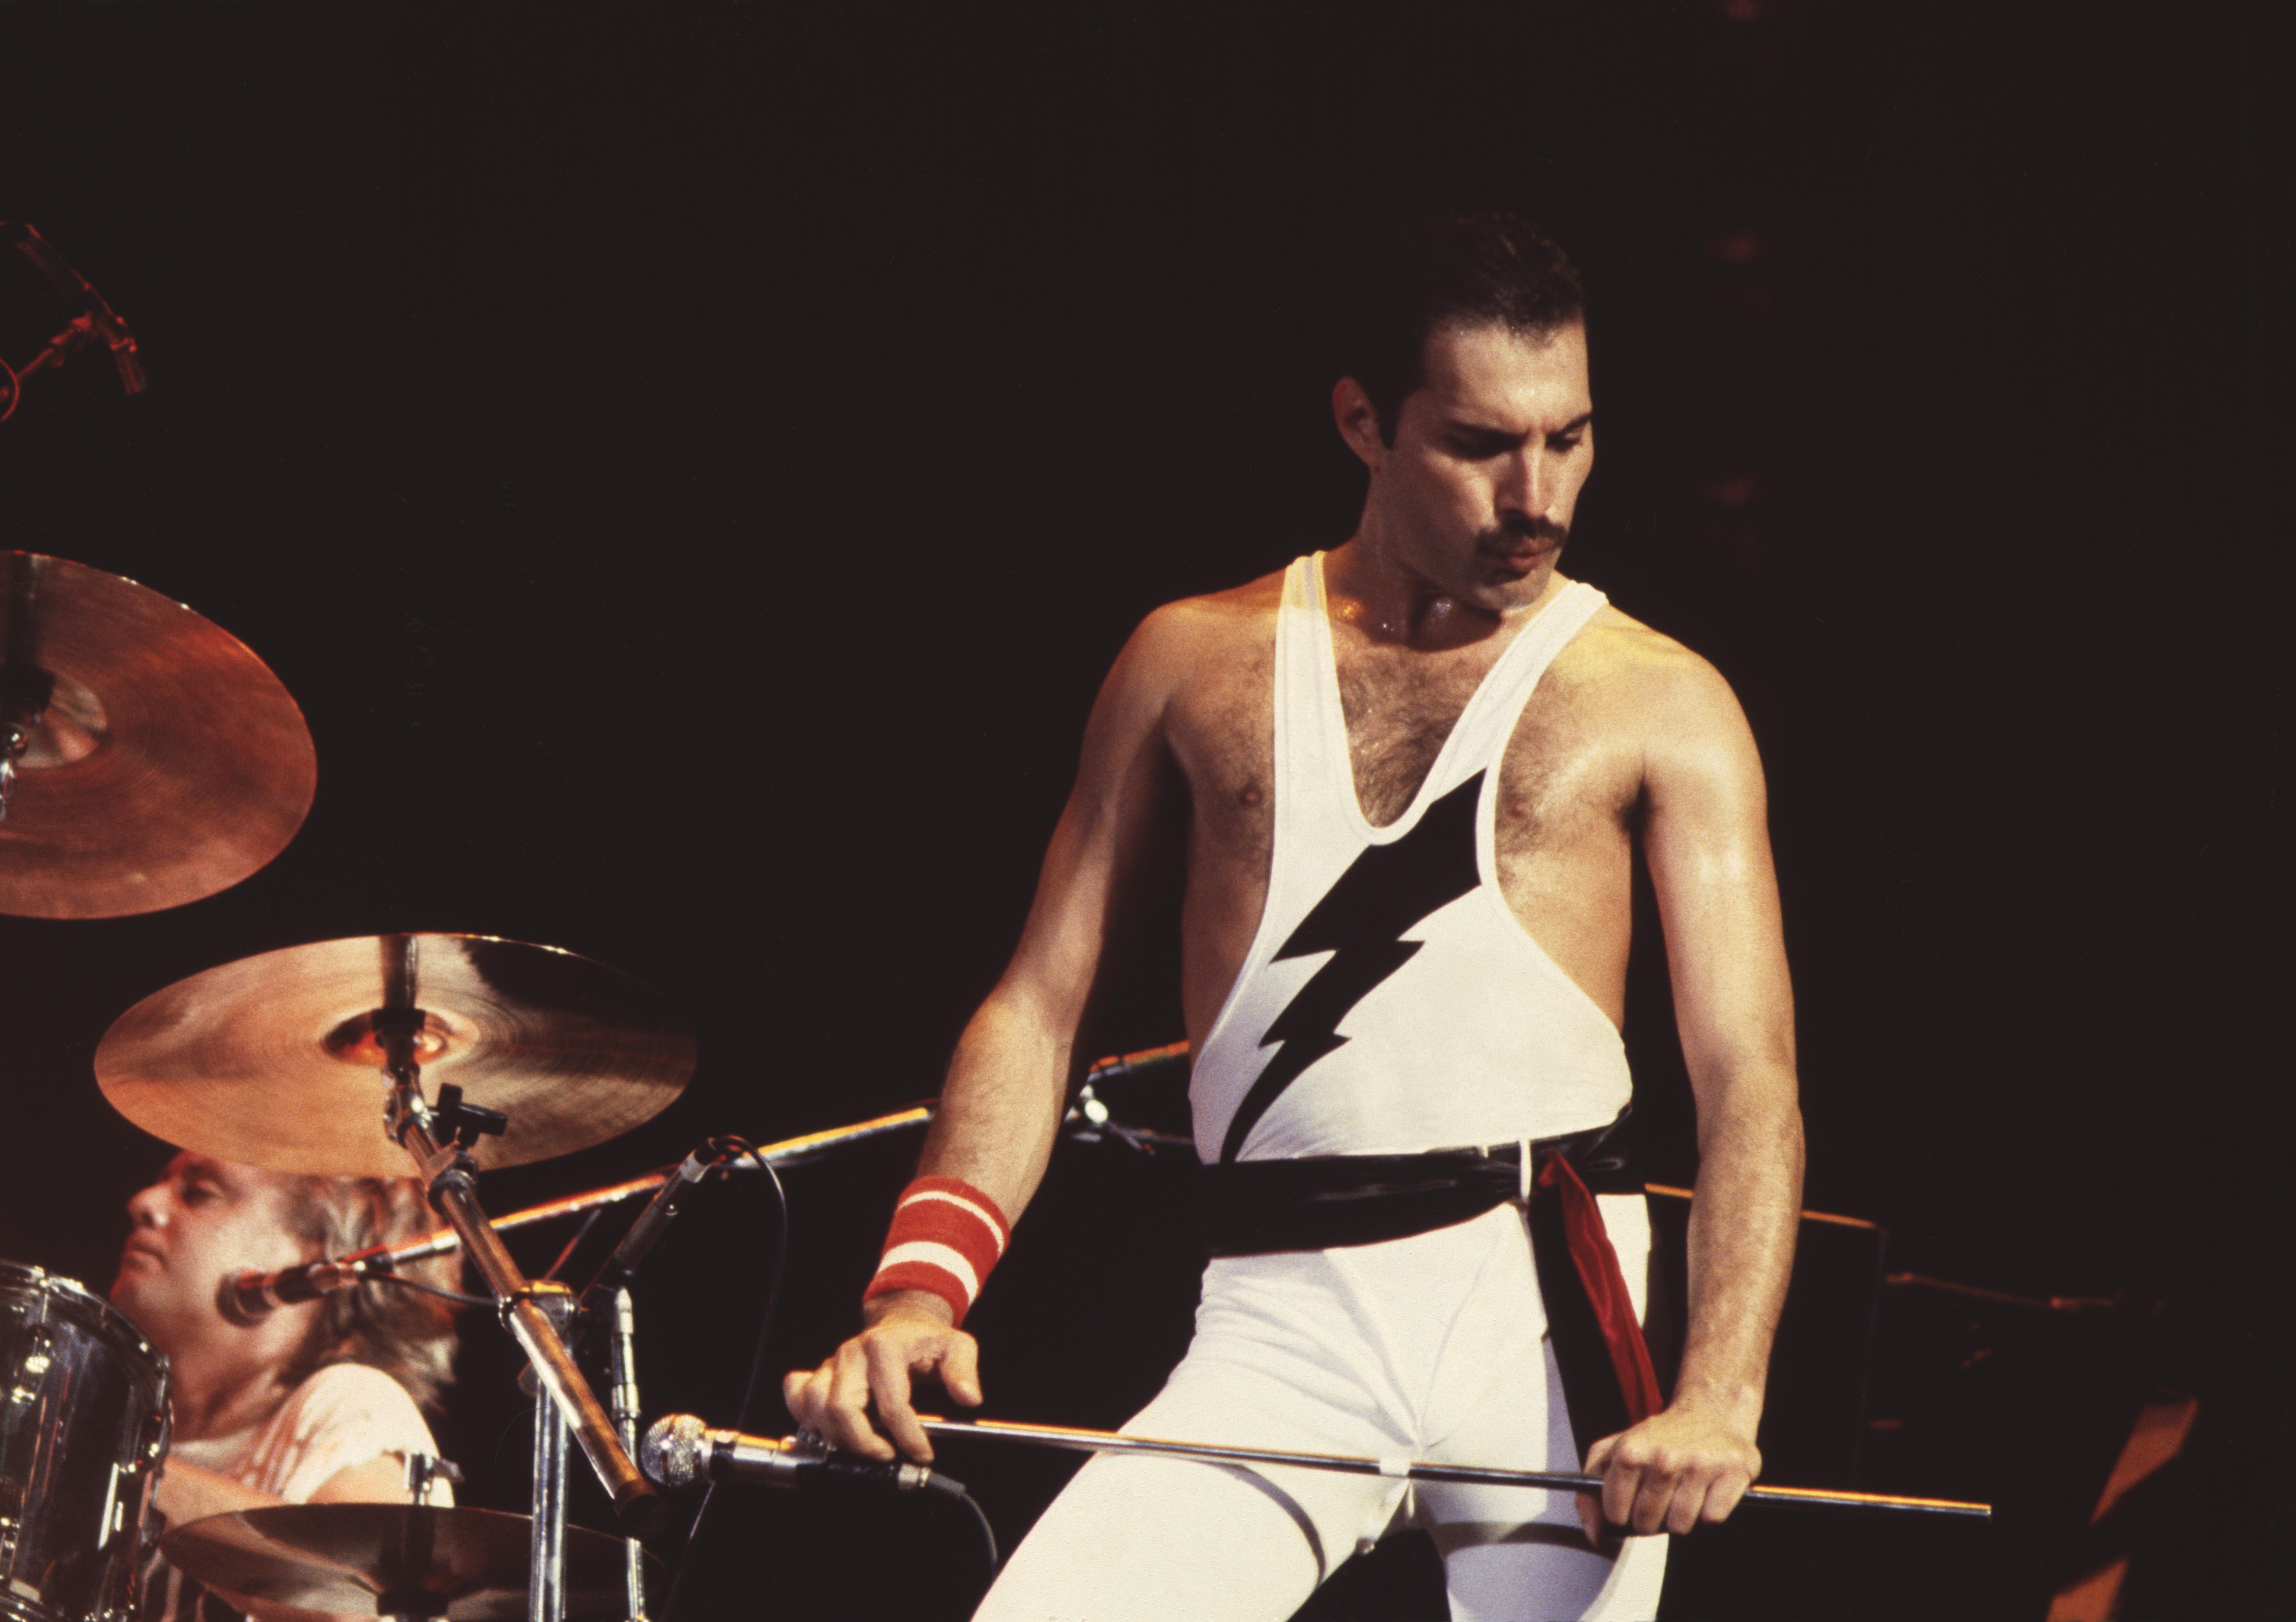 Watch New Lyric Video for Freddie Mercury's Debut Solo Single 'Love Kills'